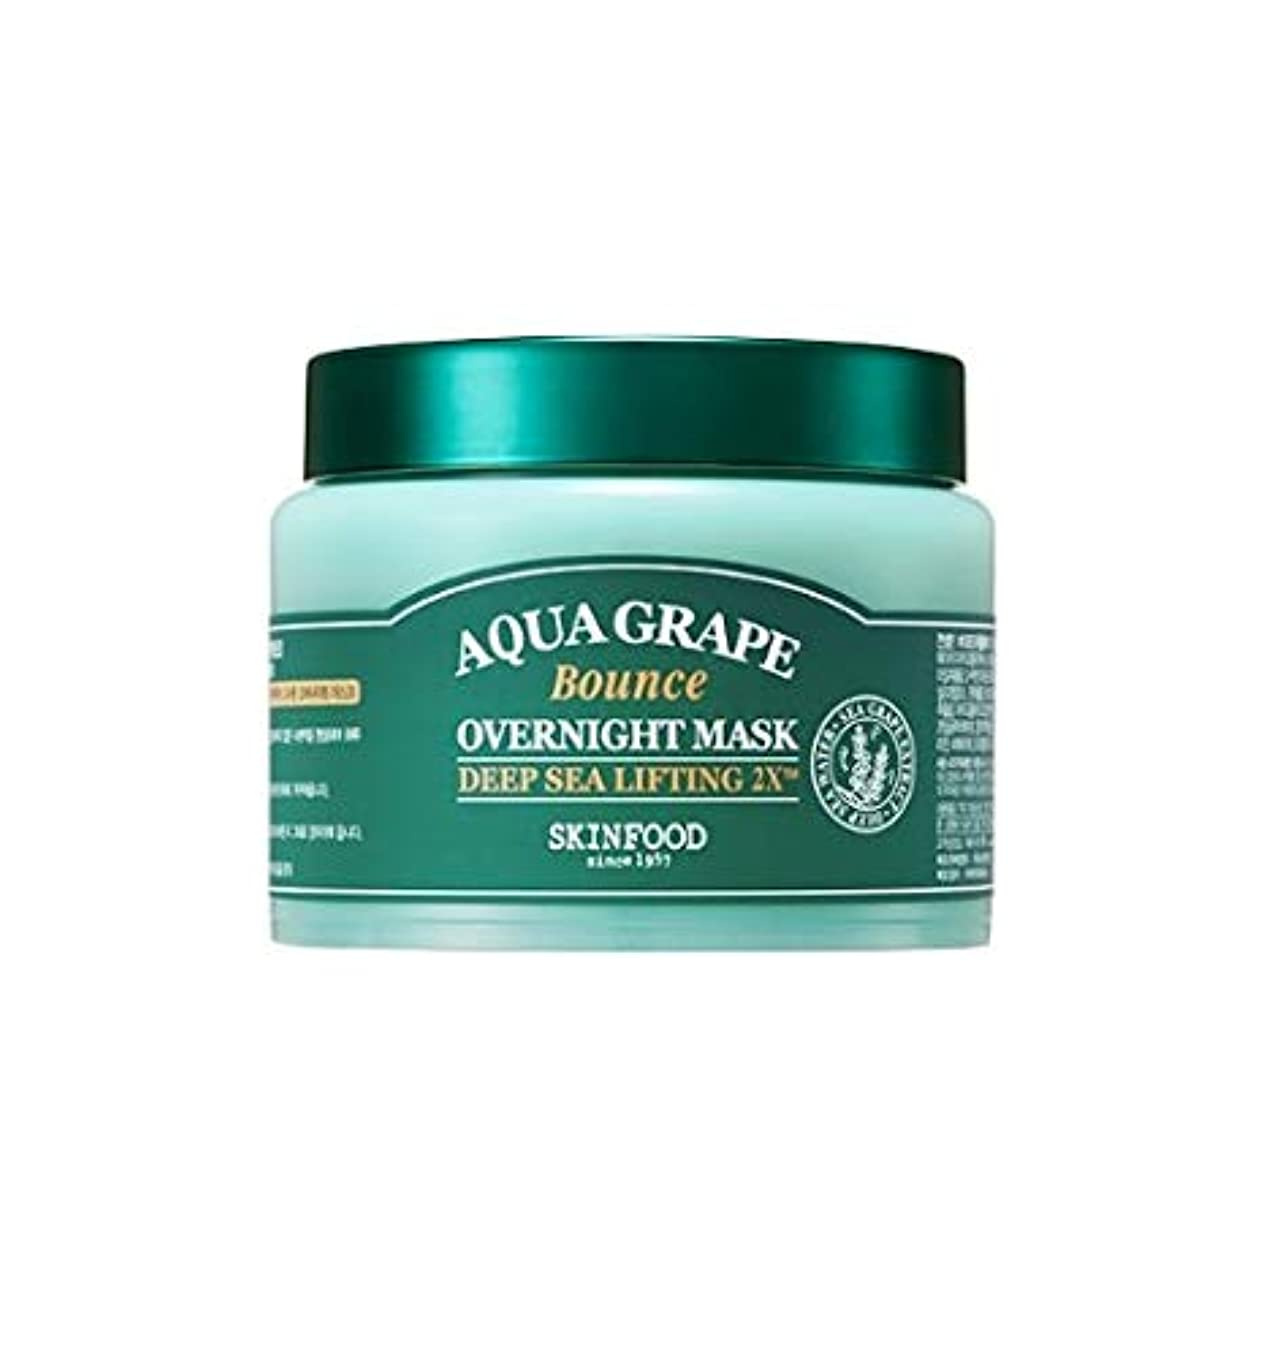 Skinfood アクアグレープバウンスオーバーナイトマスク/Aqua Grape Bounce Overnight Mask 100g [並行輸入品]